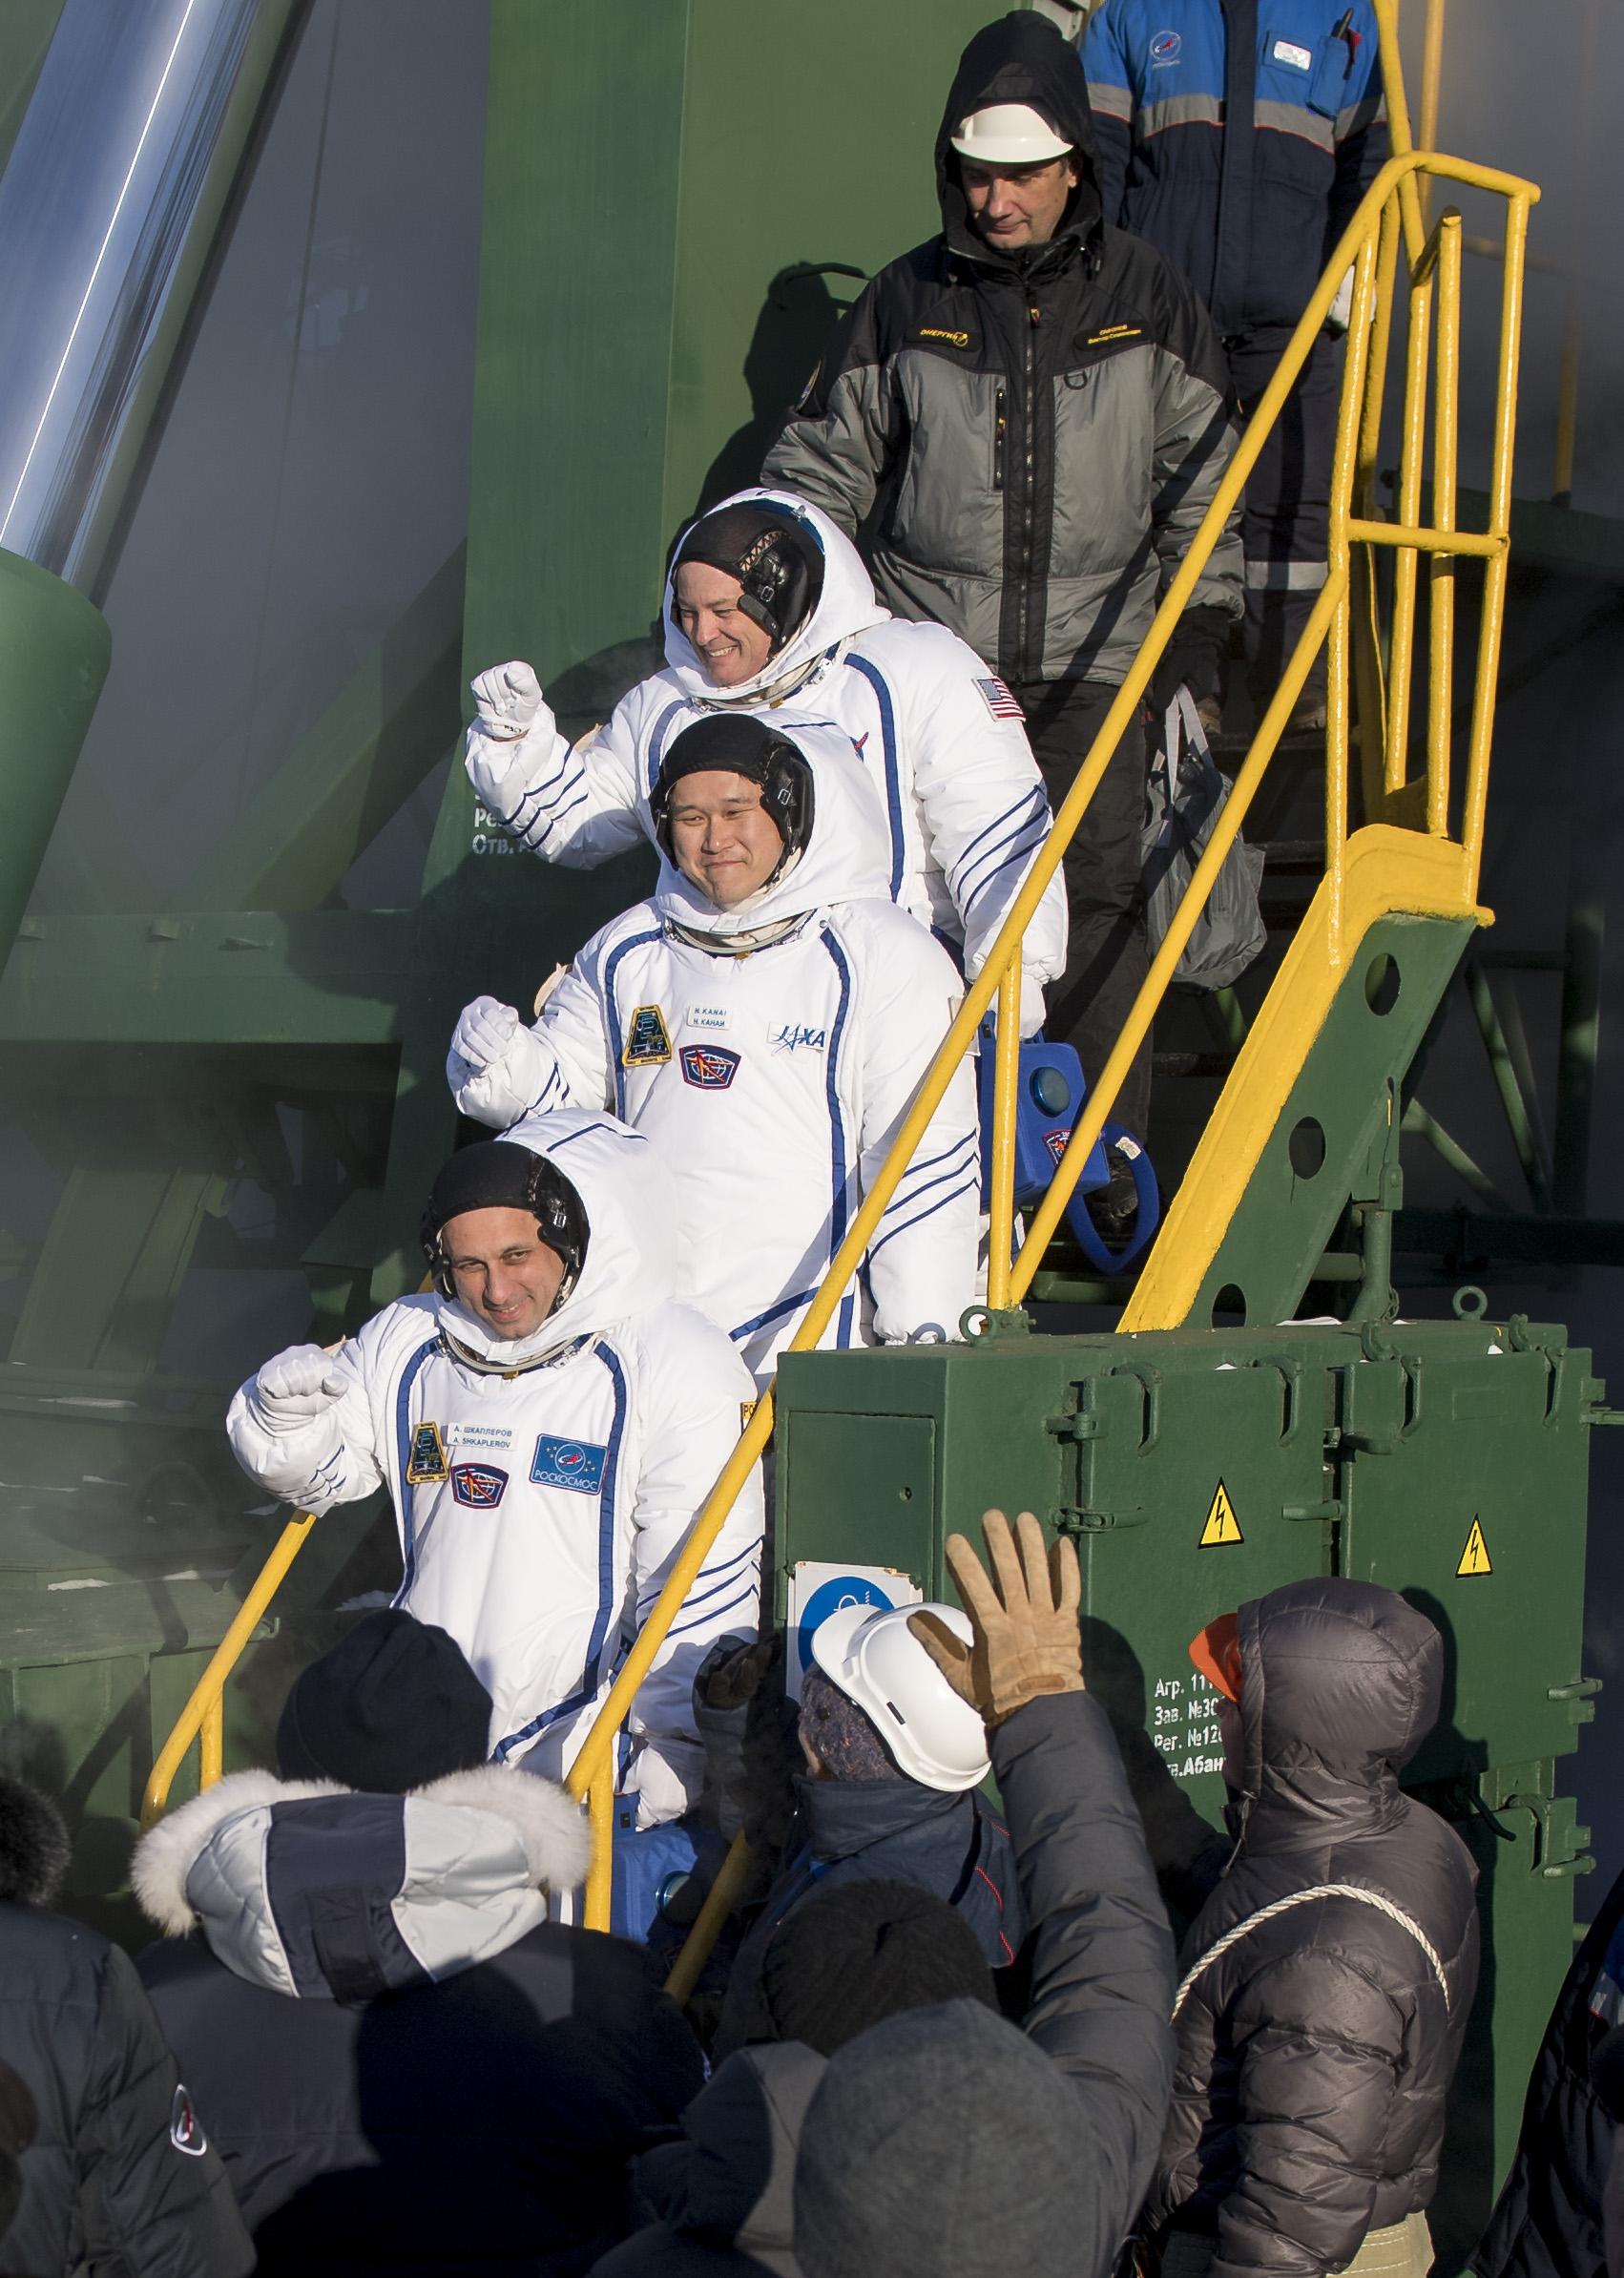 Three New Crew Members on Voyage to International Space Station | NASA